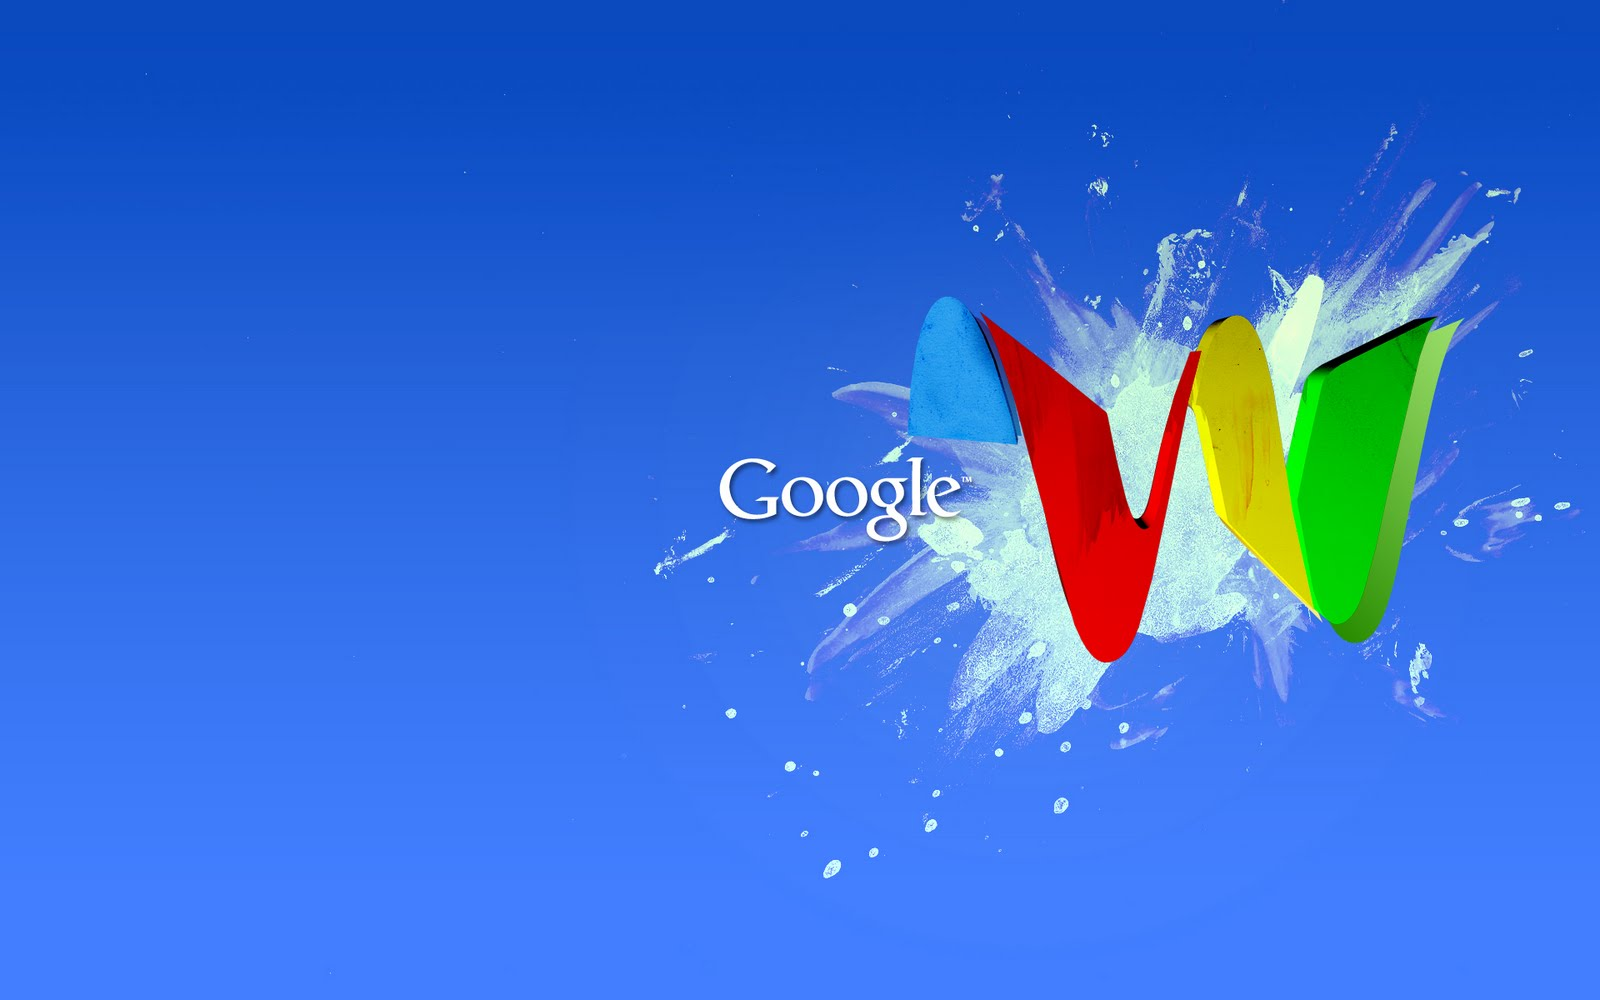 google latest hd wallpapers google latest hd wallpapers google latest 1600x1000